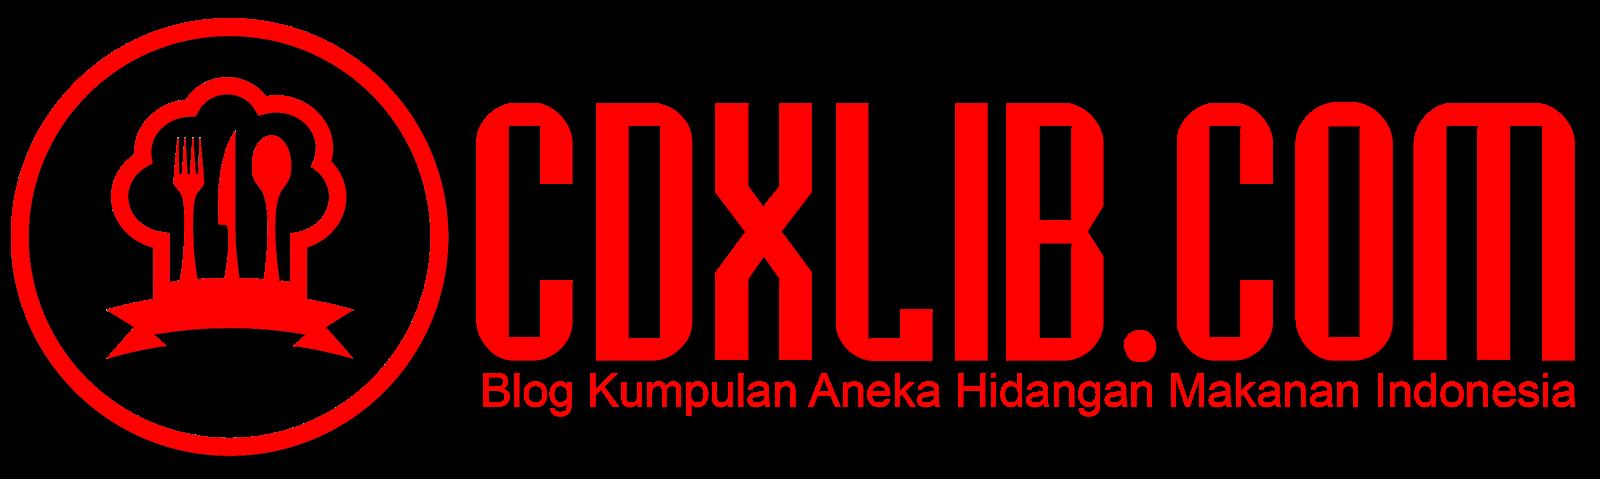 cdxlib.com